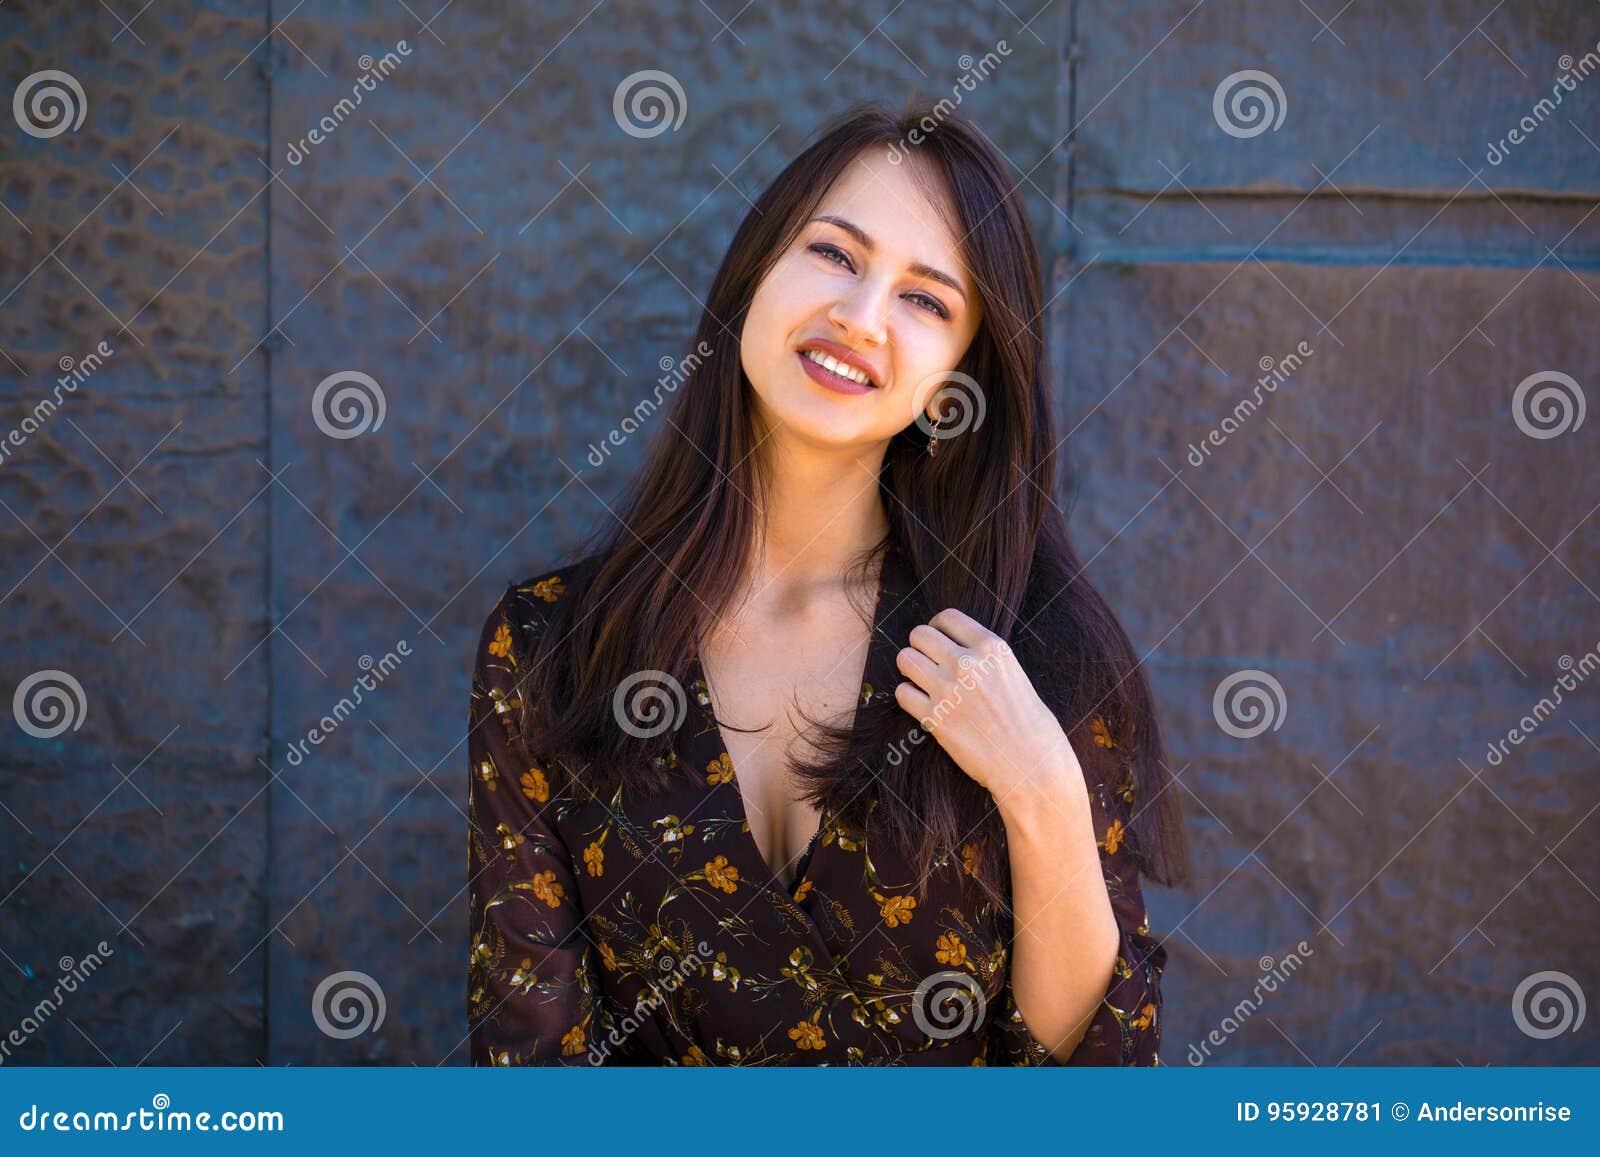 fe82ca269bc belle-femme-de-brune-dans-la-robe-brune-sexy-95928781.jpg